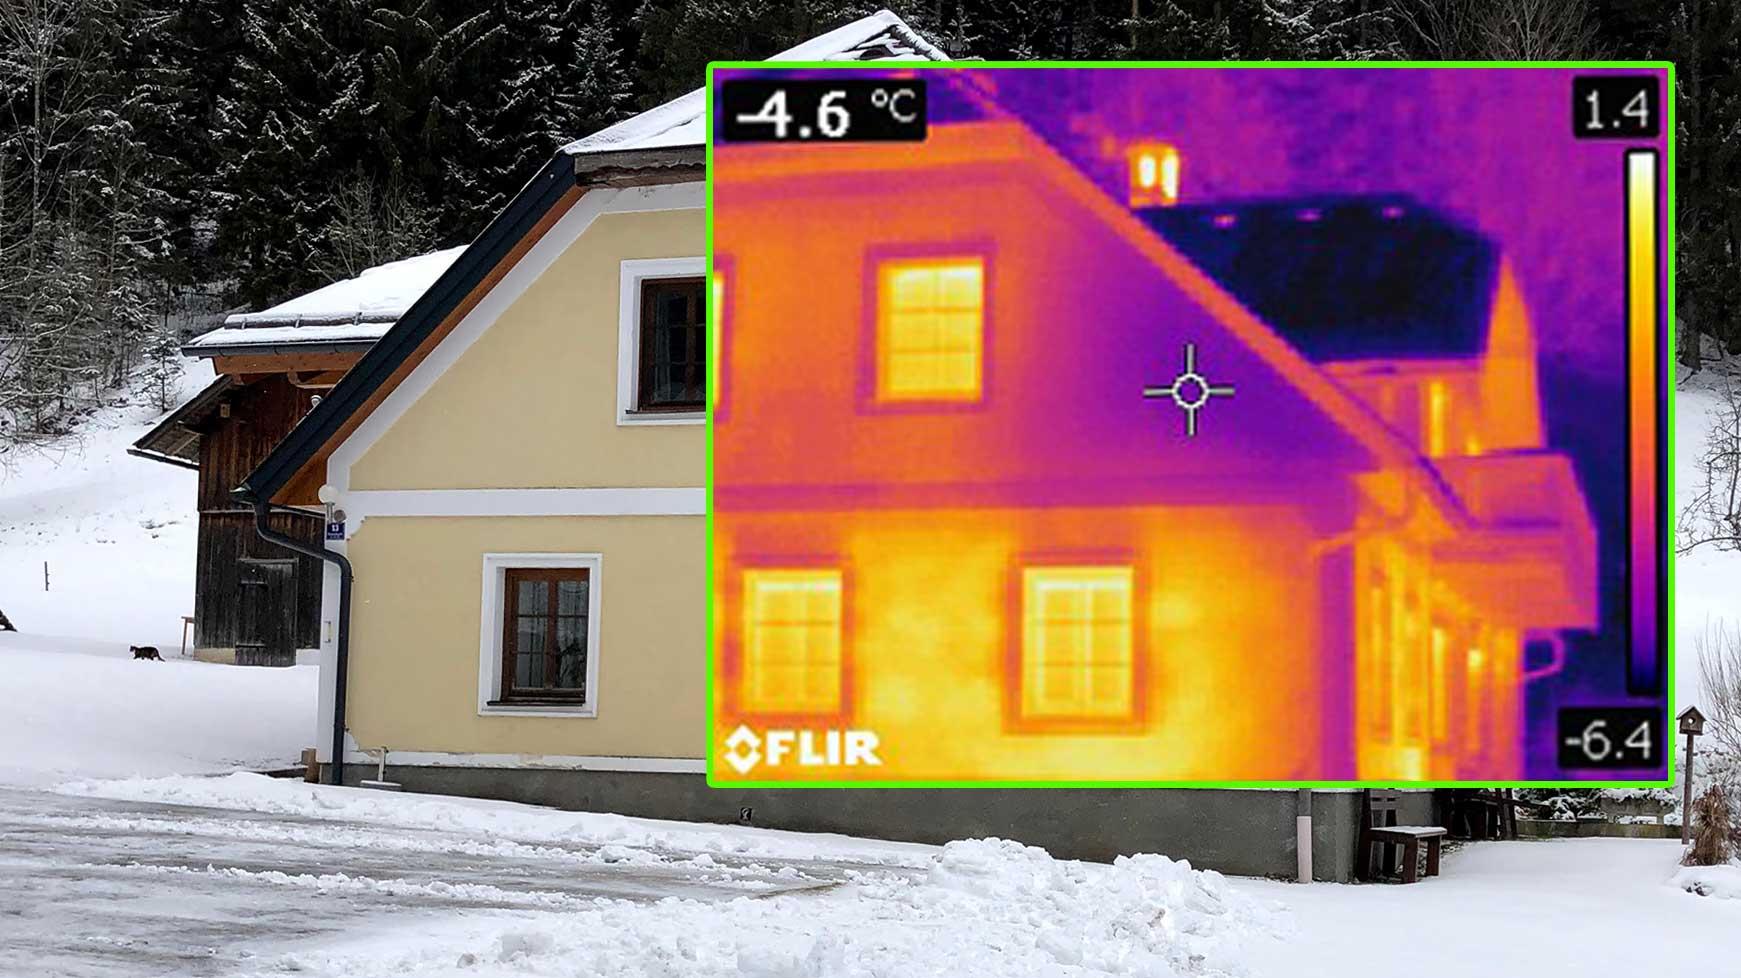 Thermografie - Bericht